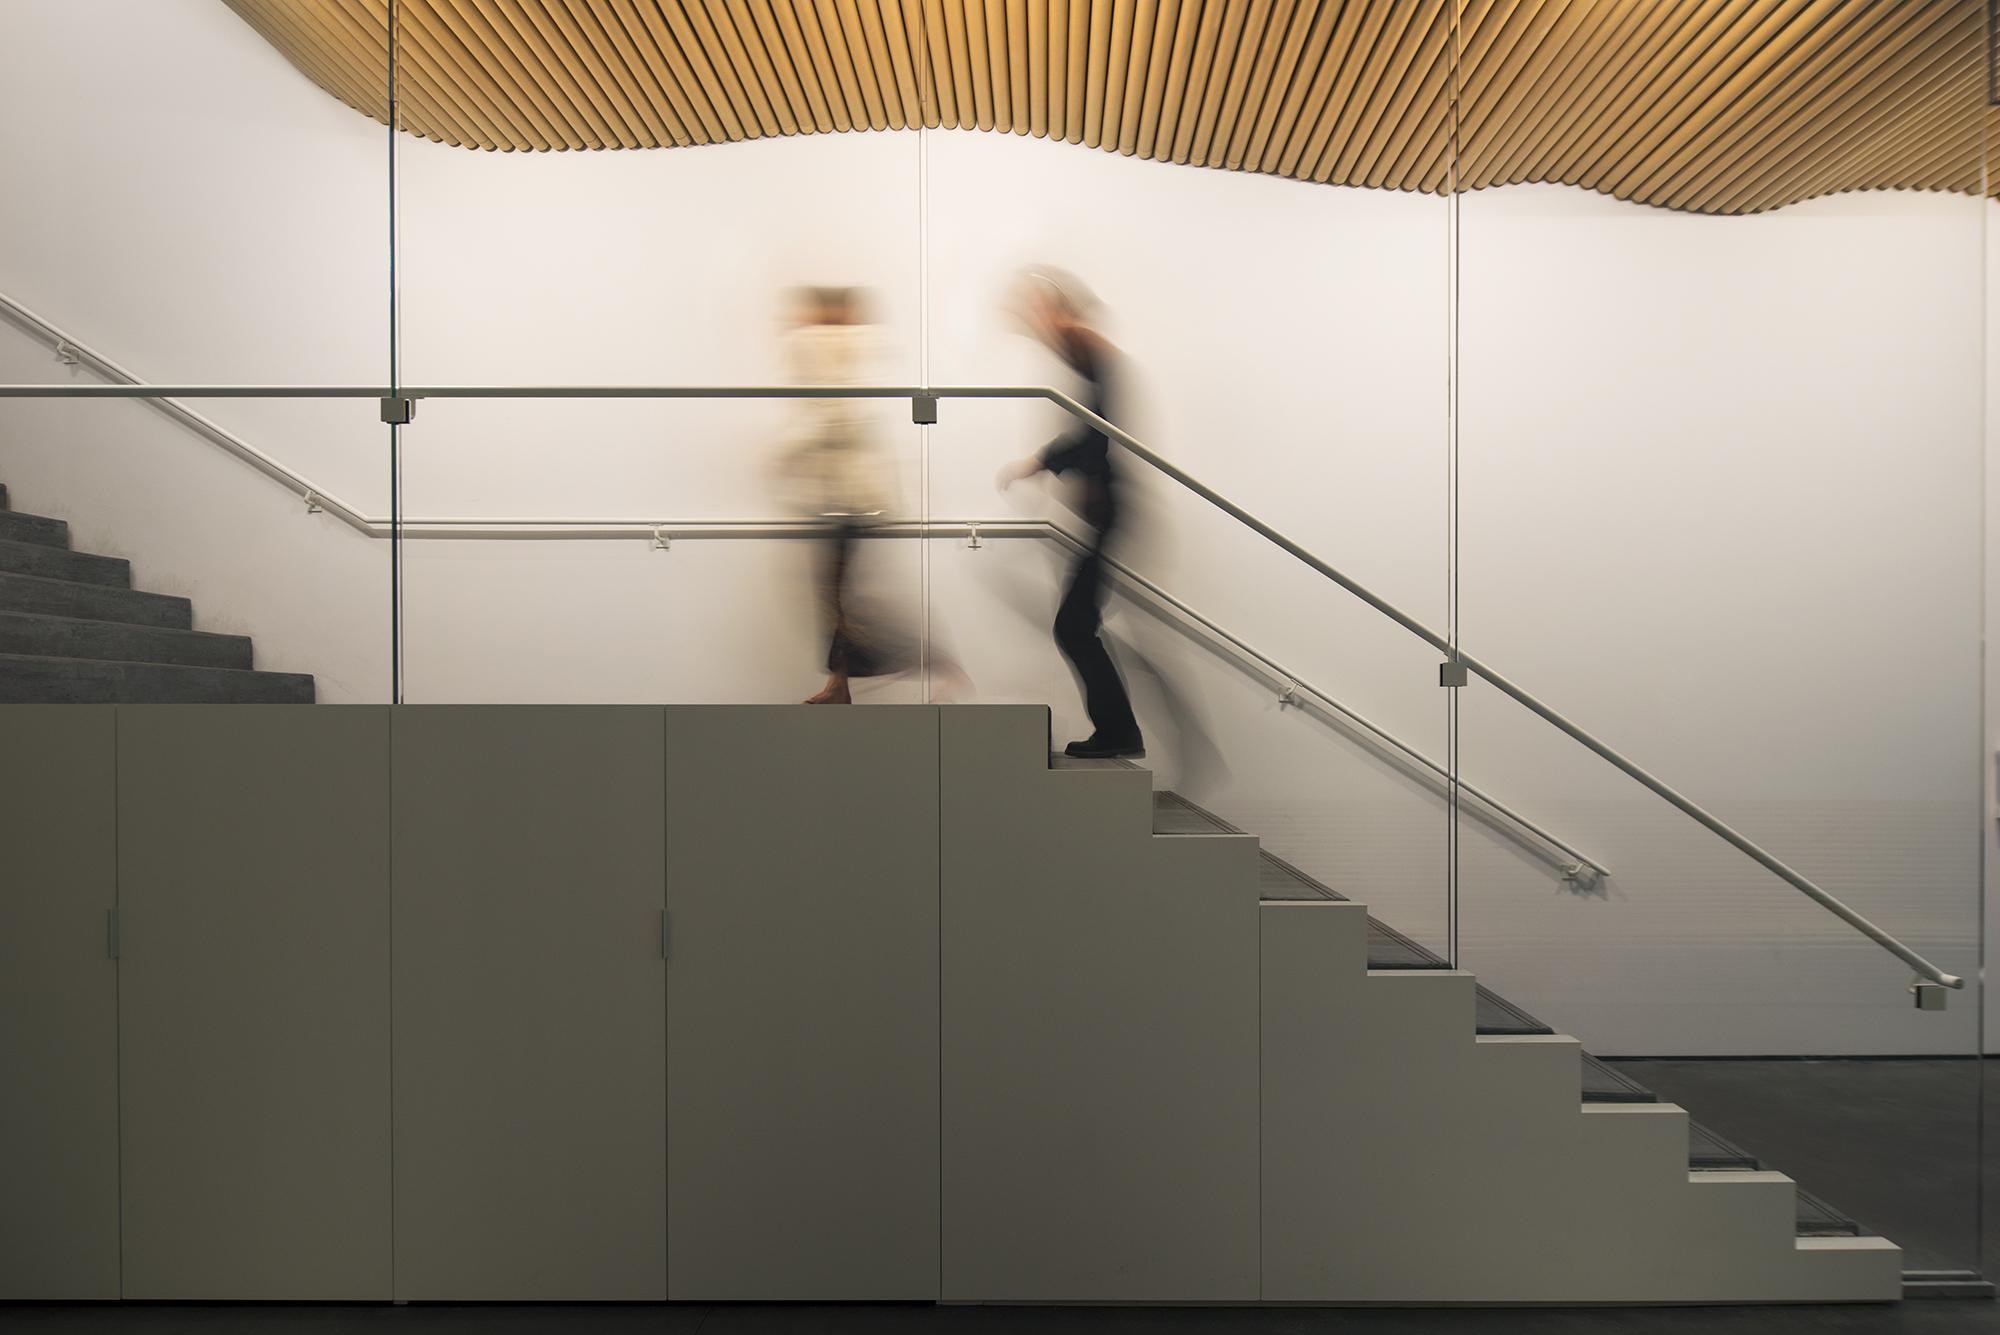 shigeru ban architects | aspen art museum | aspen usa